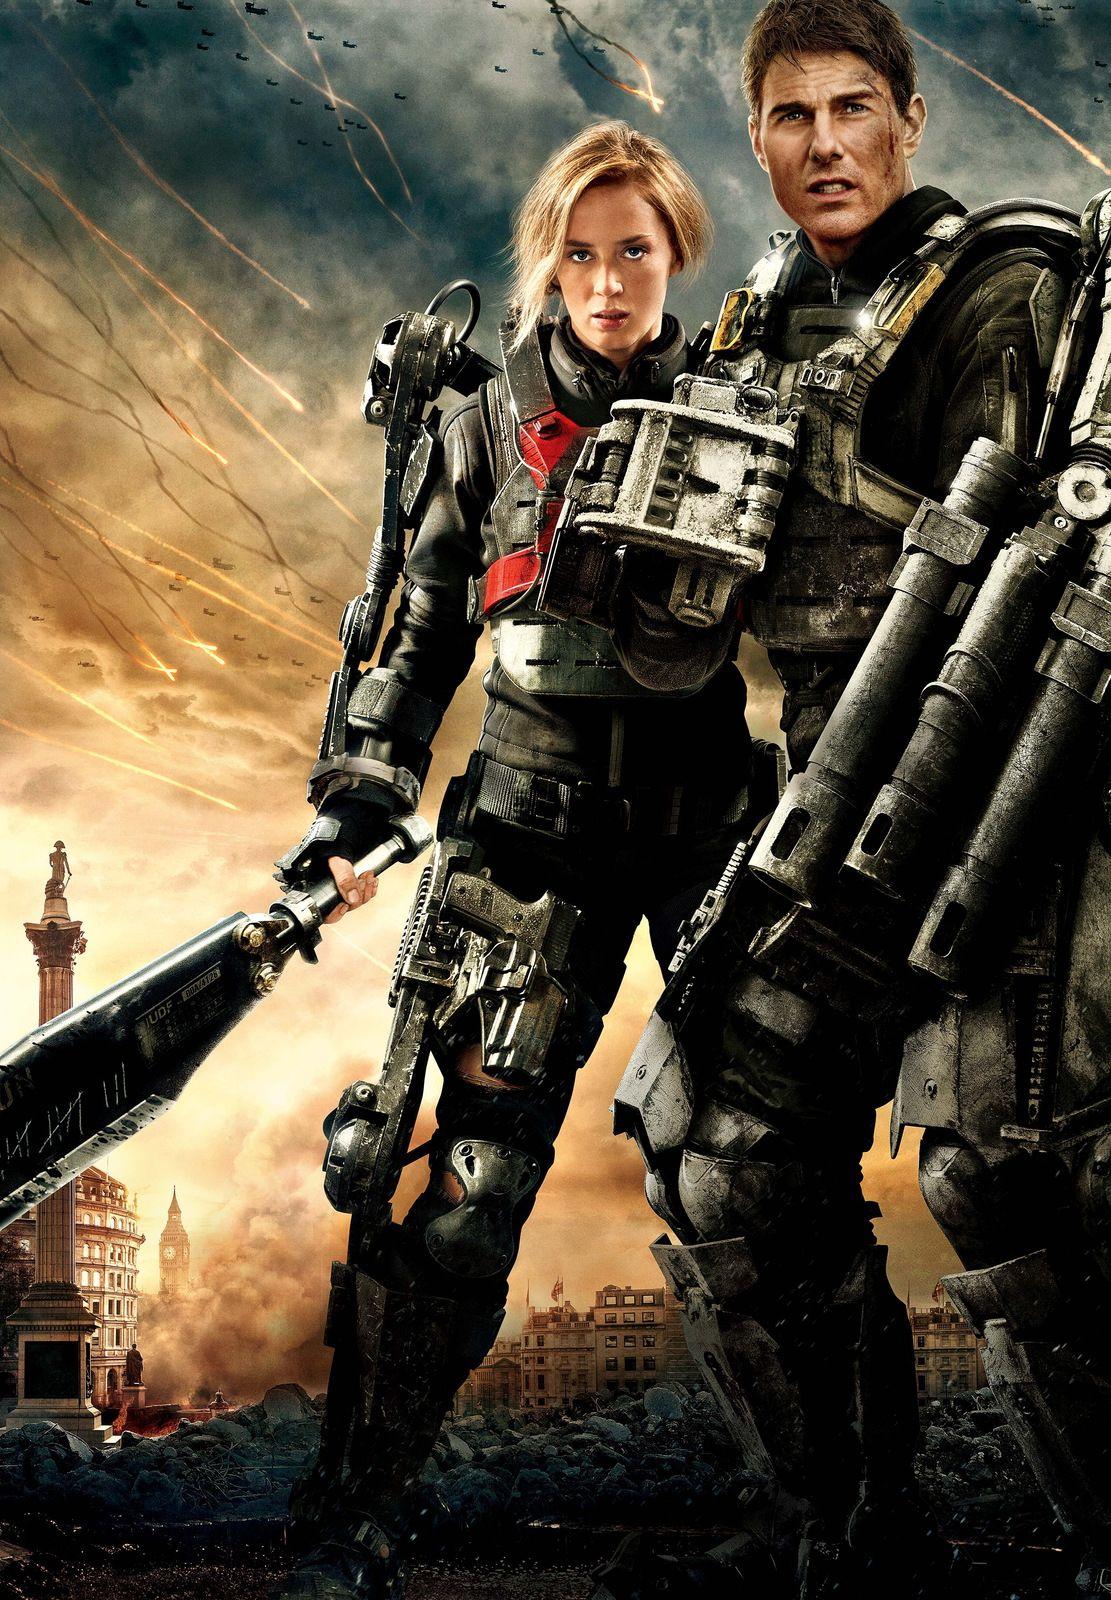 Edge of Tomorrow Tom Cruise Emily Blunt   Sci-Fi Exosuit ...